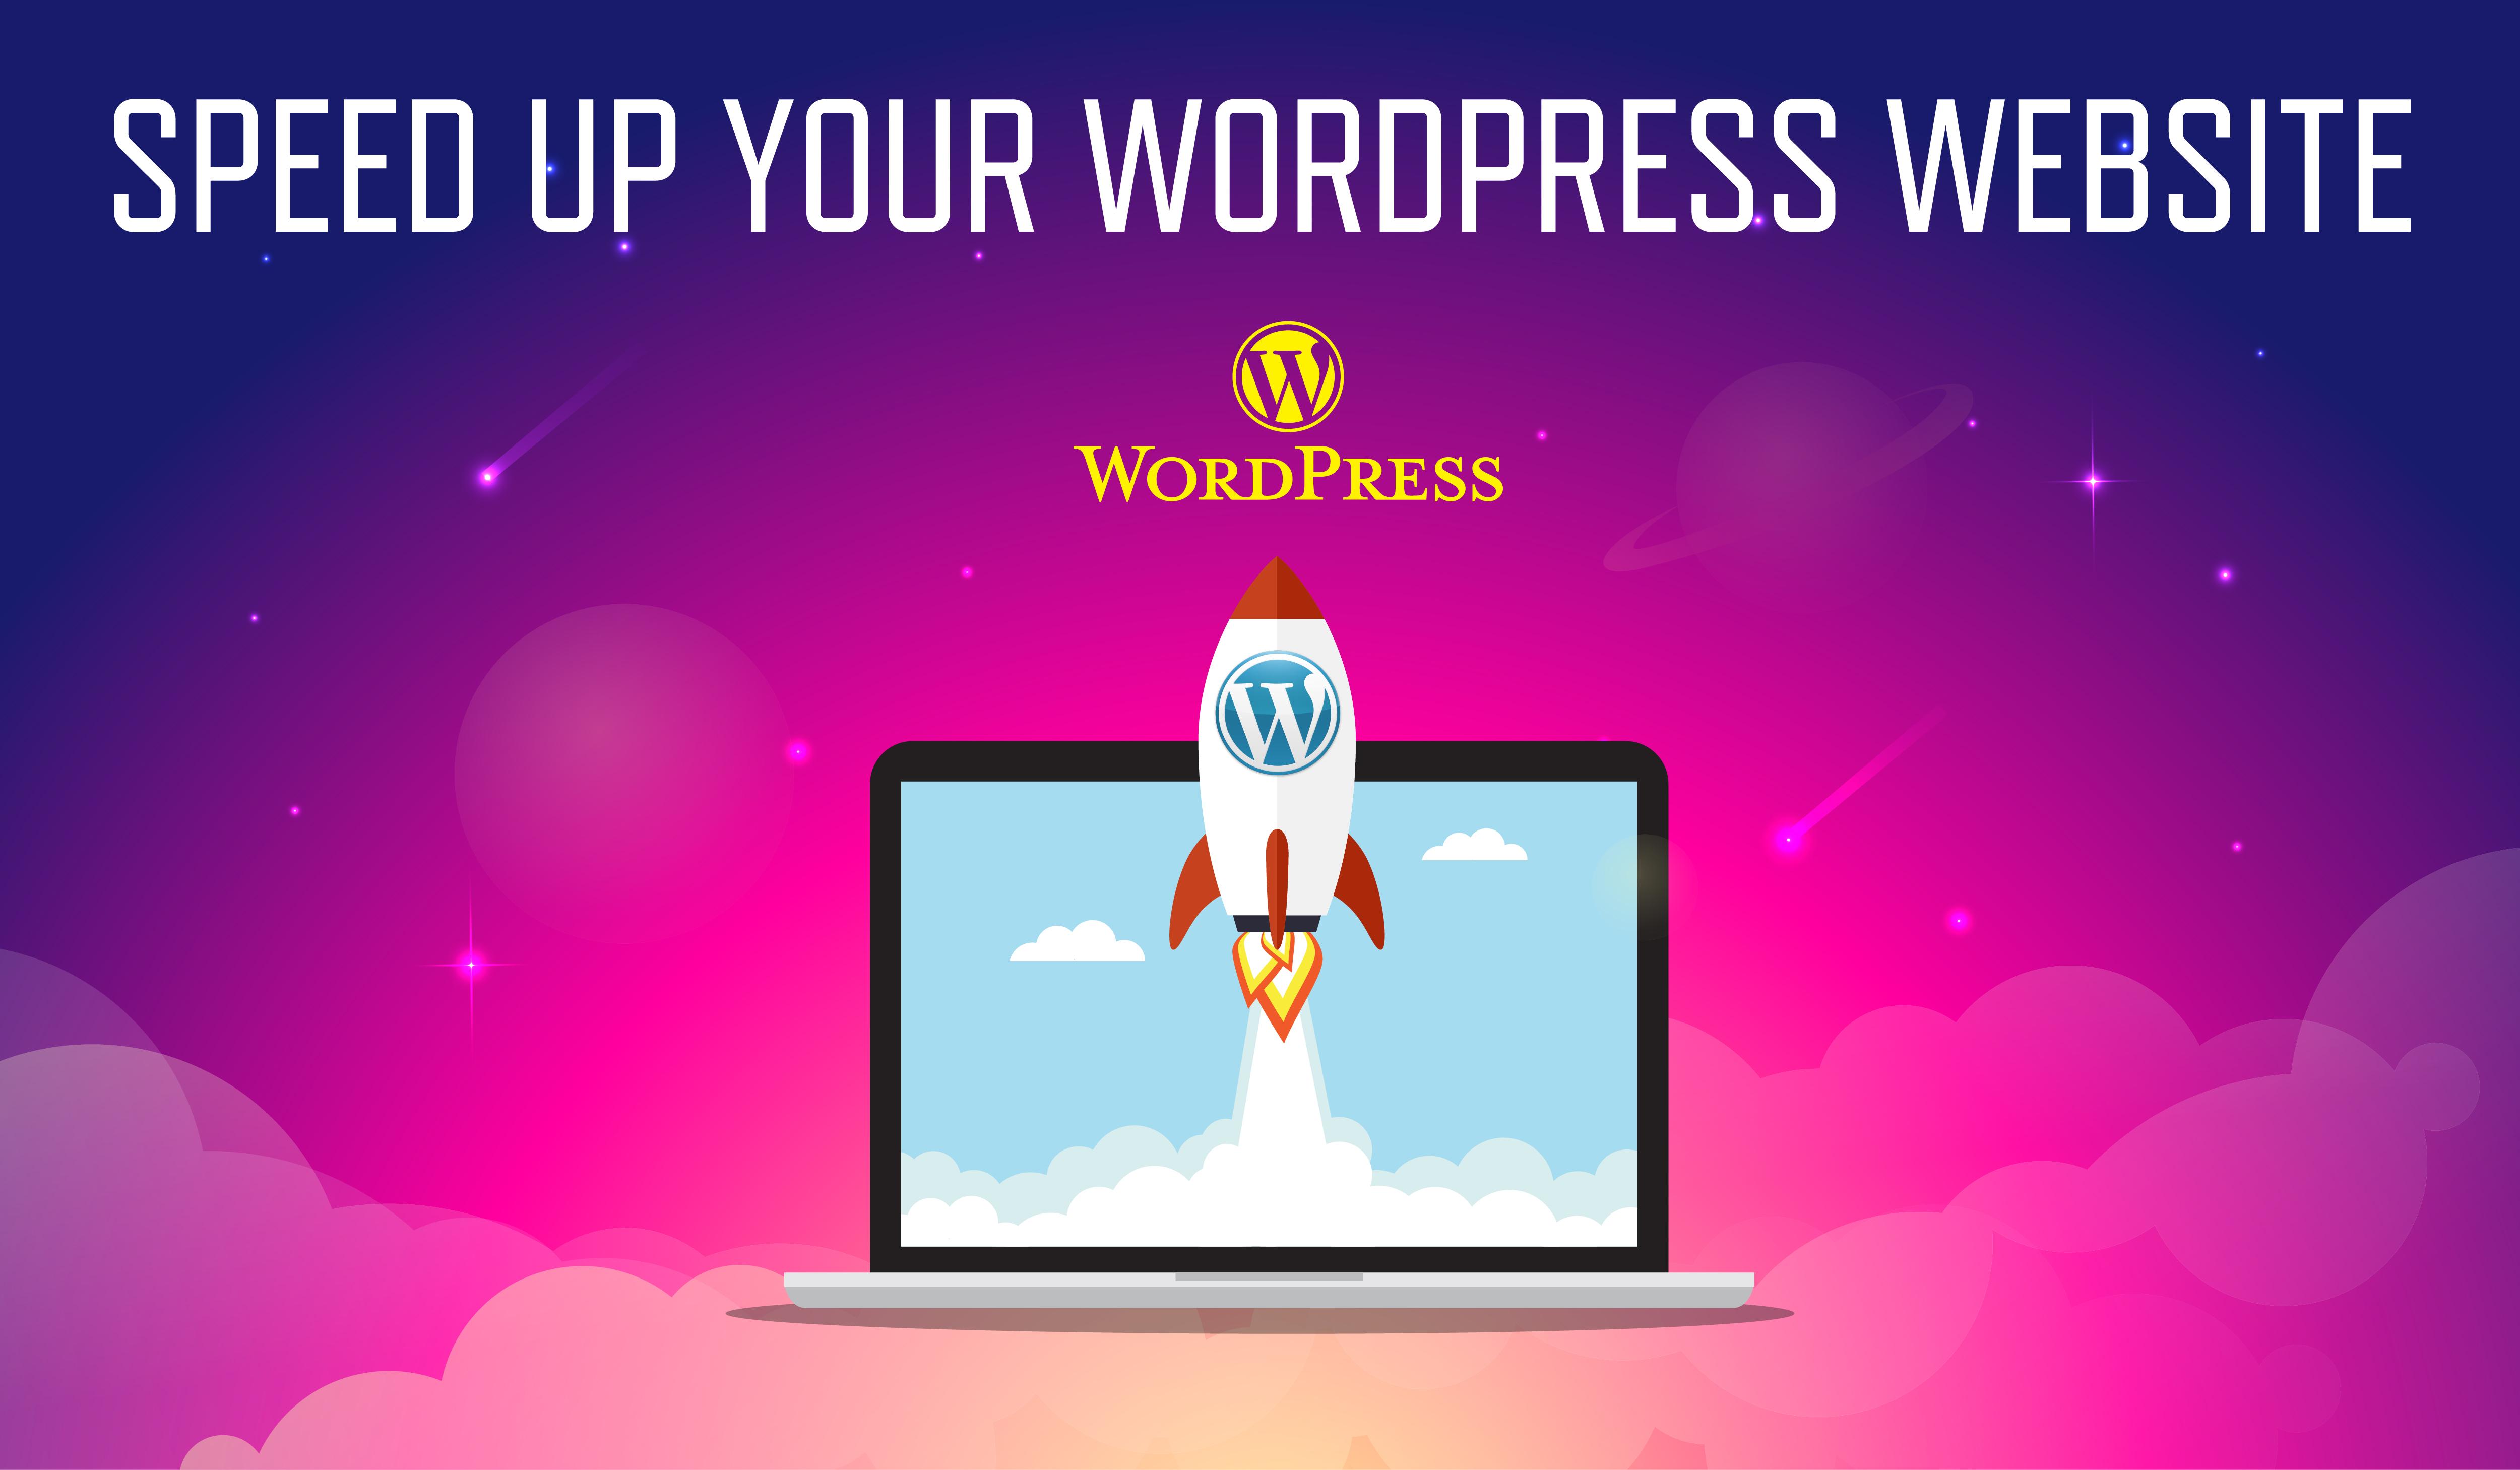 Boost Your WordPress Website Speed in 3 Days